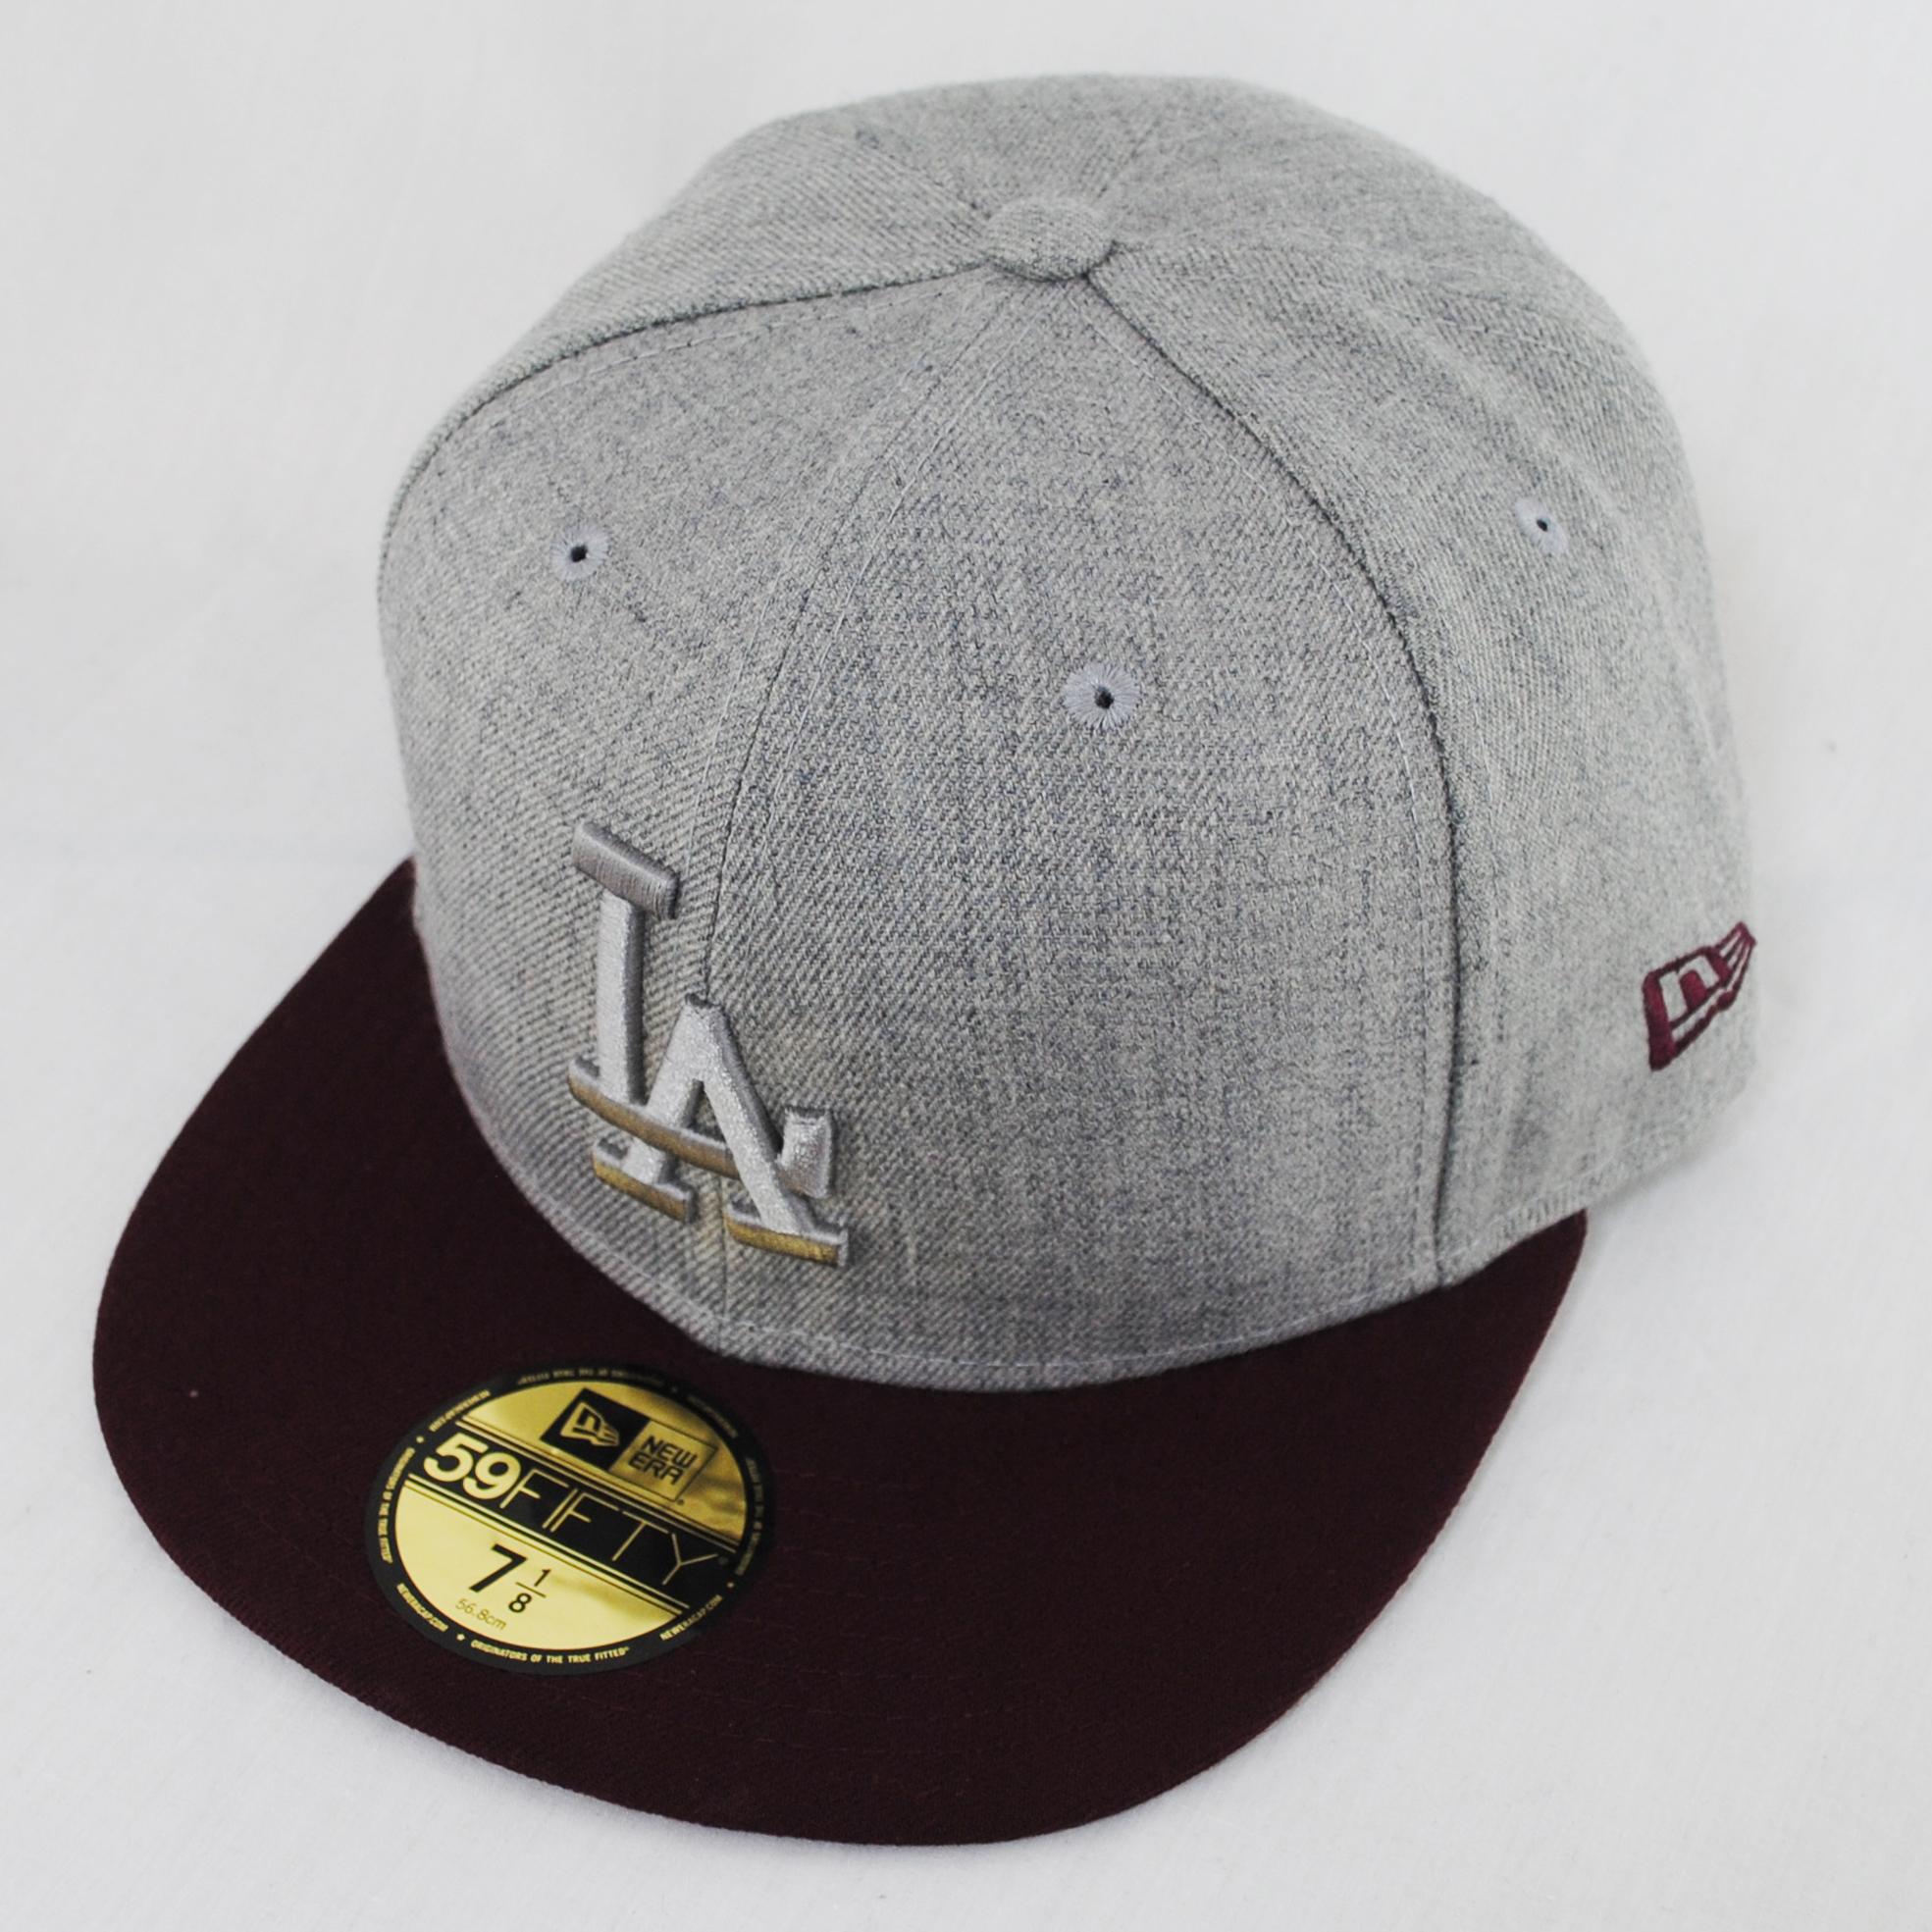 Dodger Hats Lids: New Era 59fifty LA Dodgers Poptonal Maroon Heather Flat